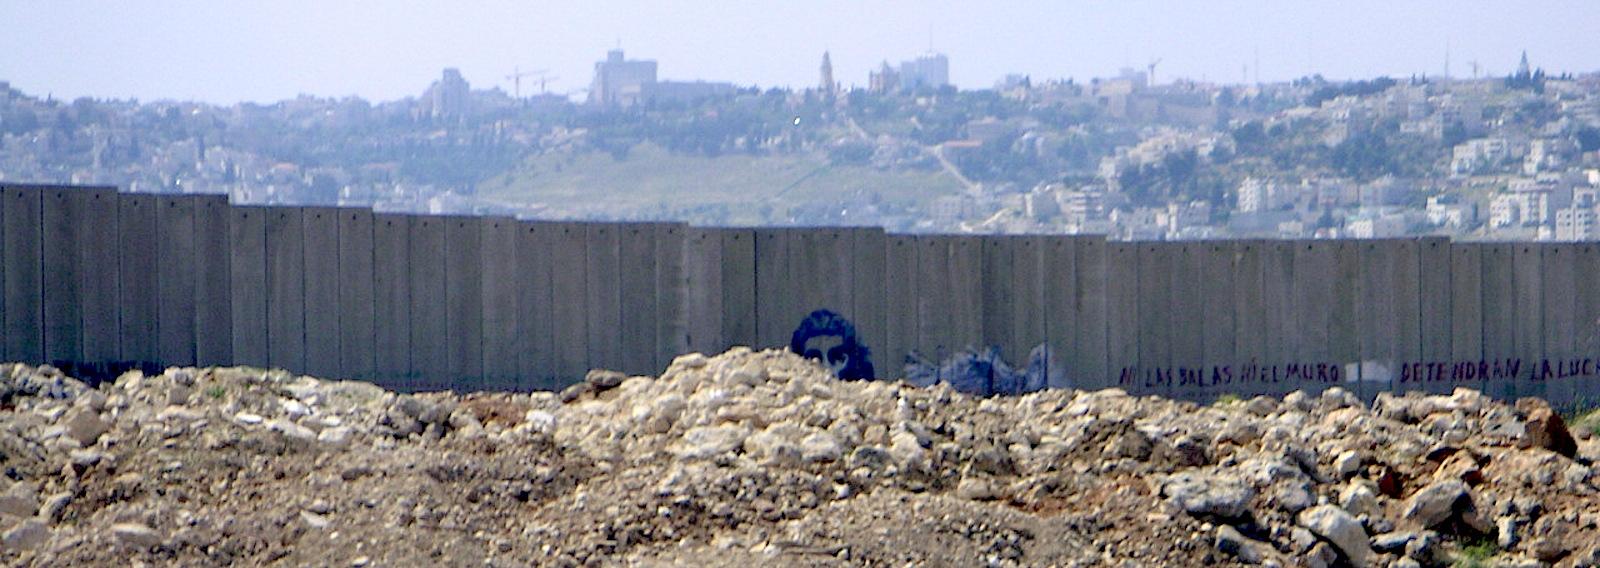 Западный берег: Стена...